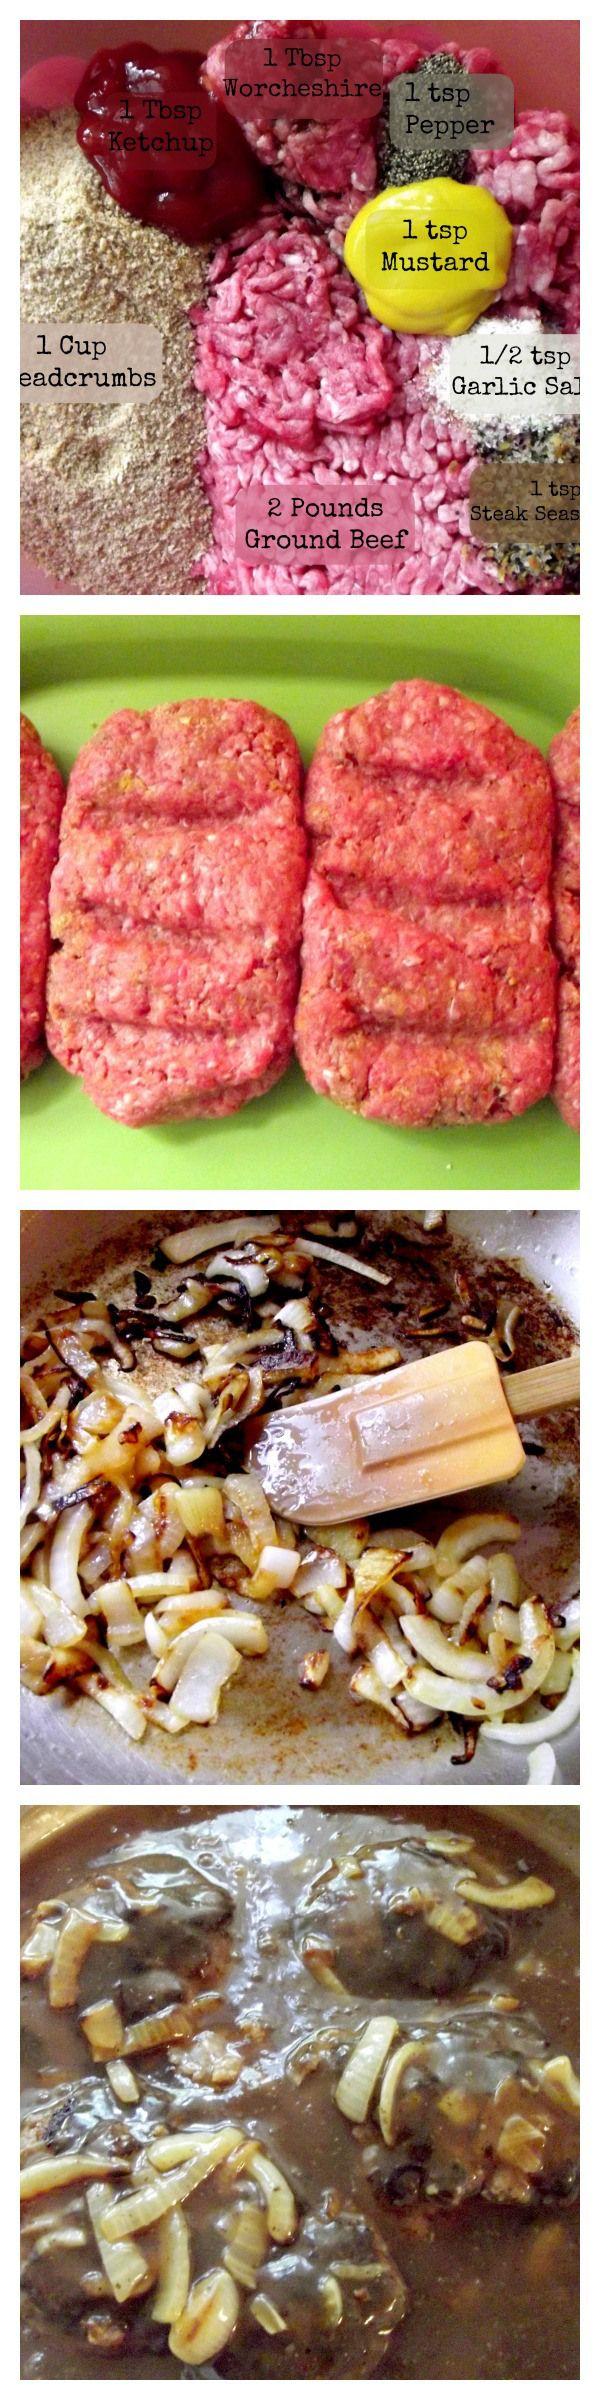 Salisbury SteakLife With The Crust Cut Off